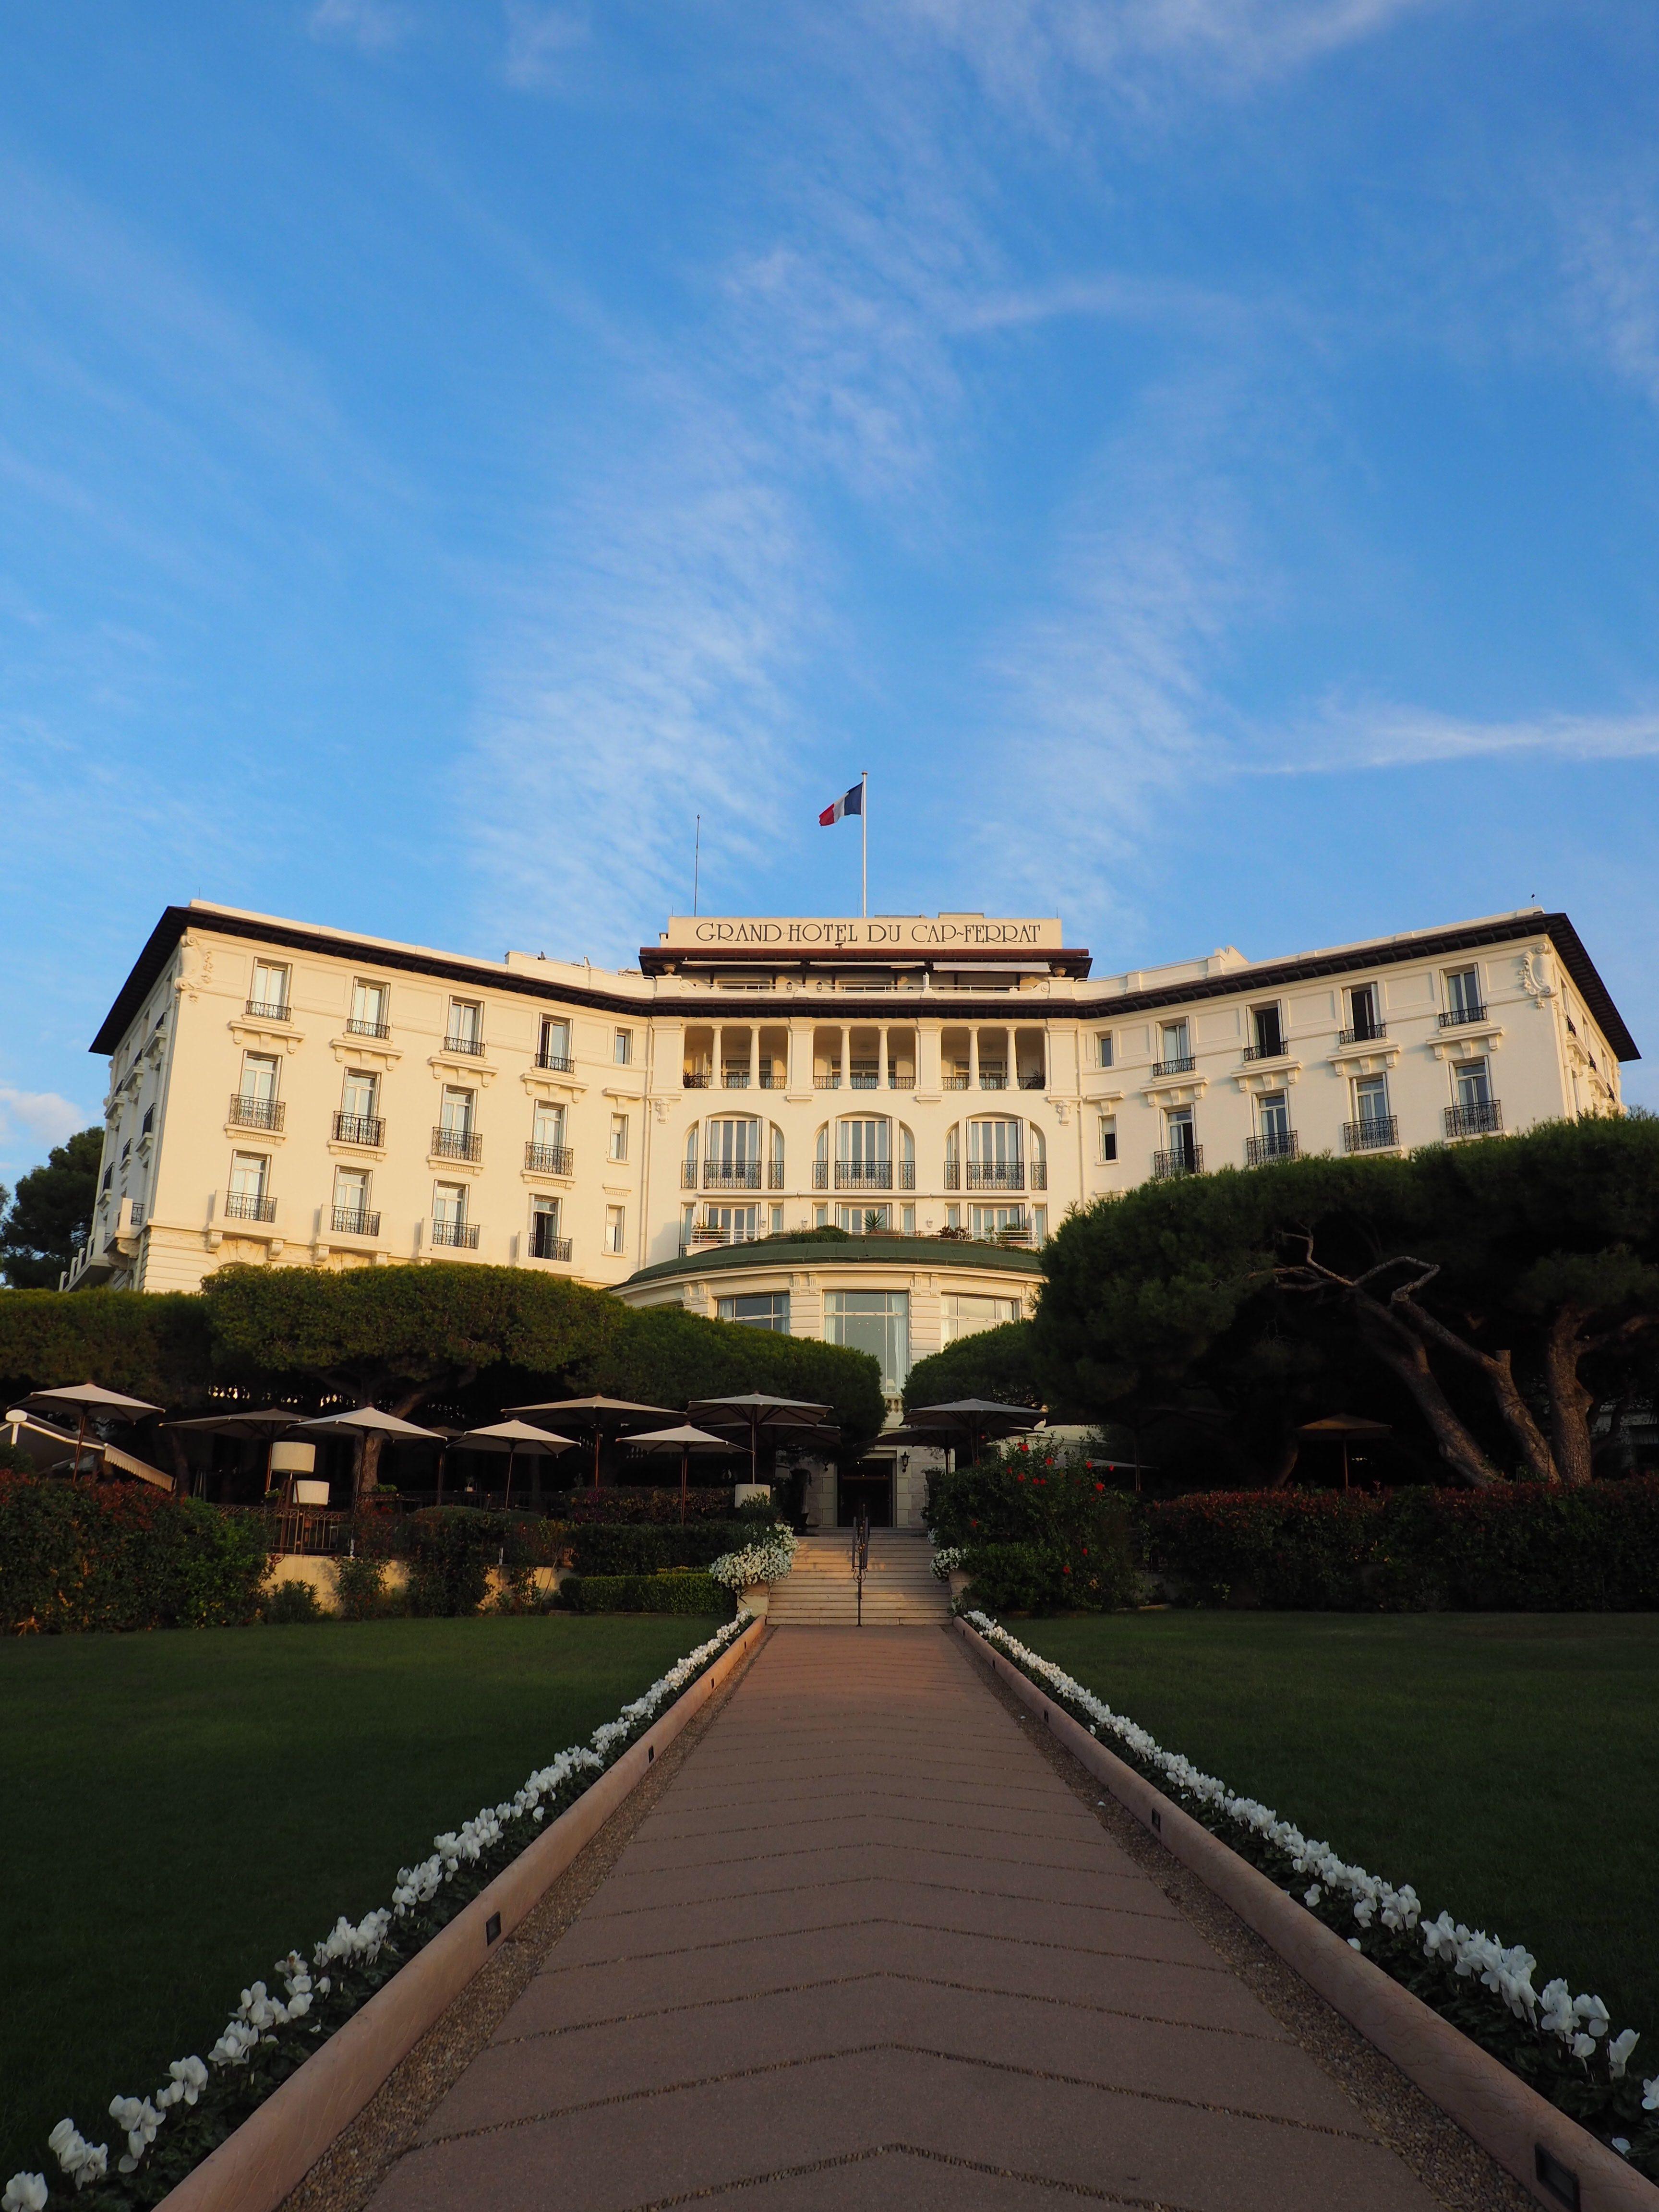 @exotiktraveler's cover photo for 'Hotel Review: Grand-Hotel du Cap-Ferrat, a Four Seasons Hotel by Exotiktraveler'